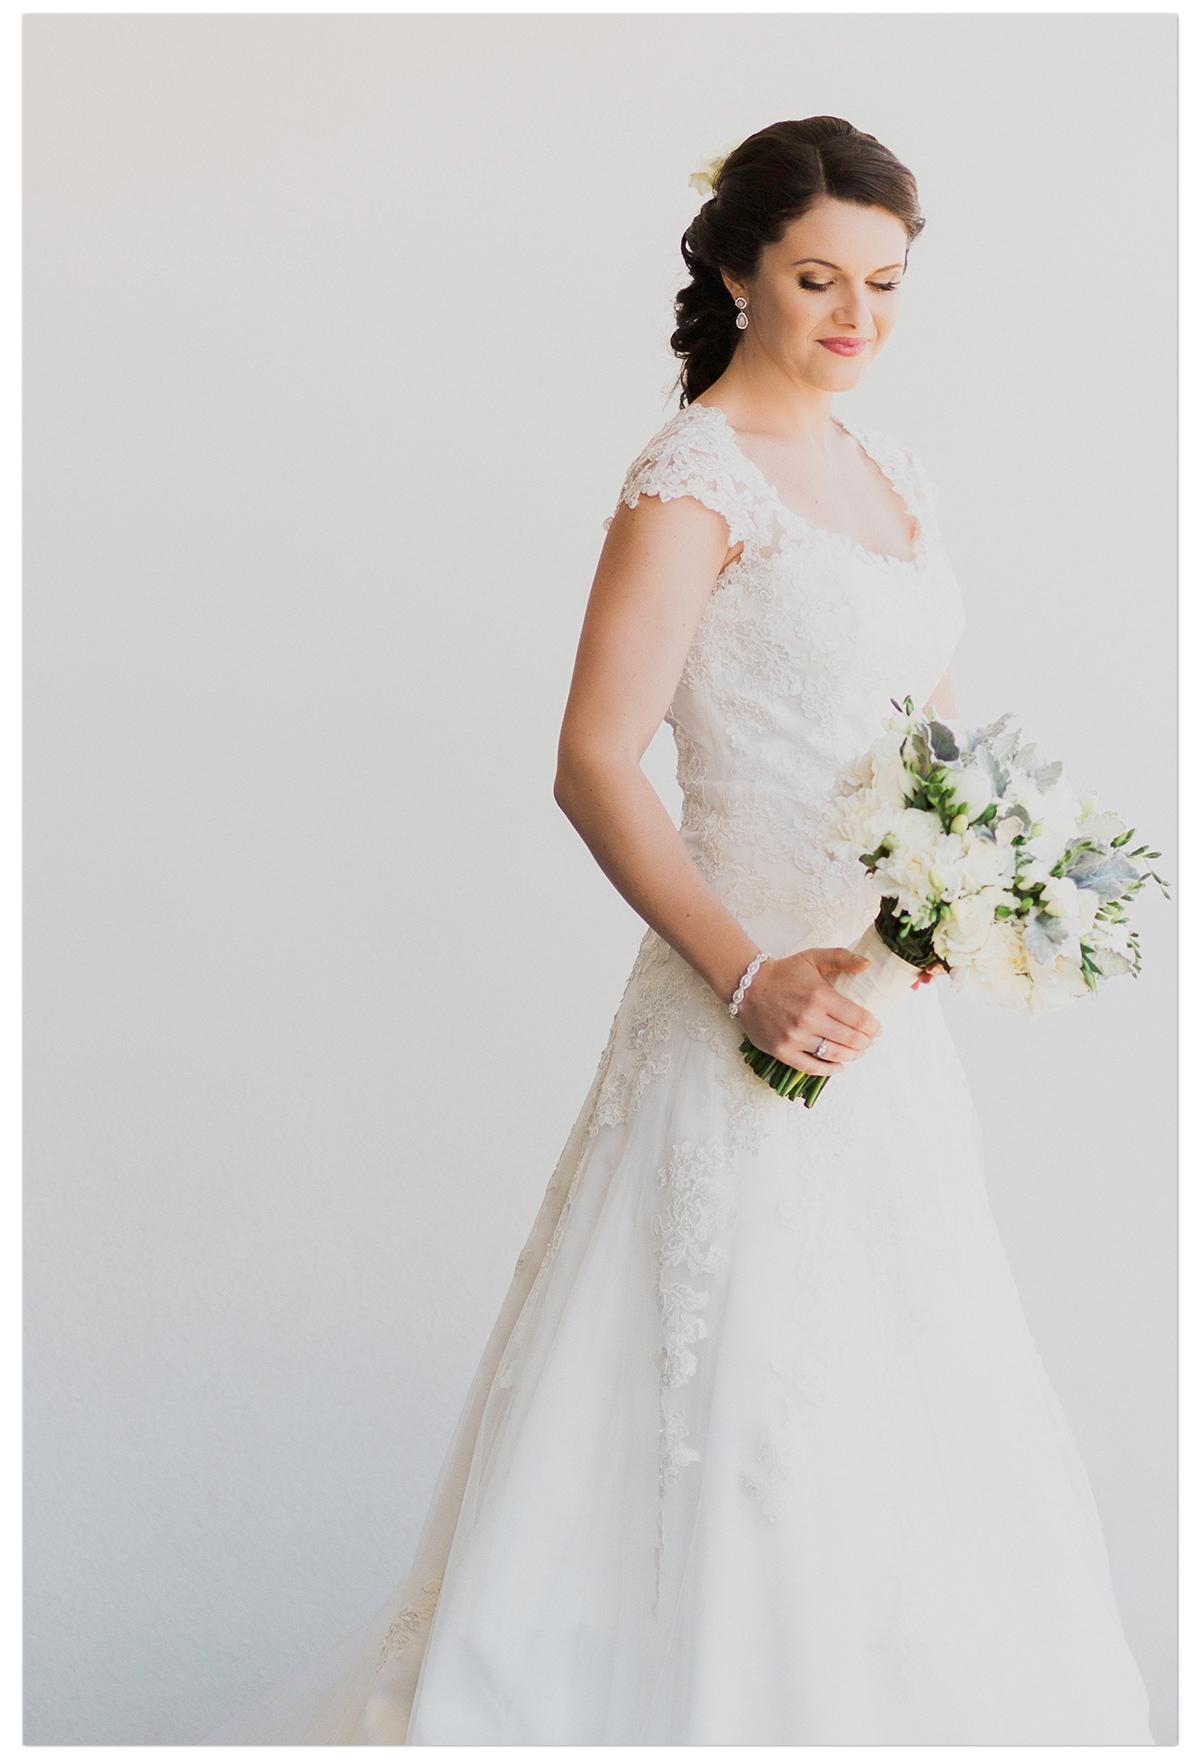 bride_in_lace_dress